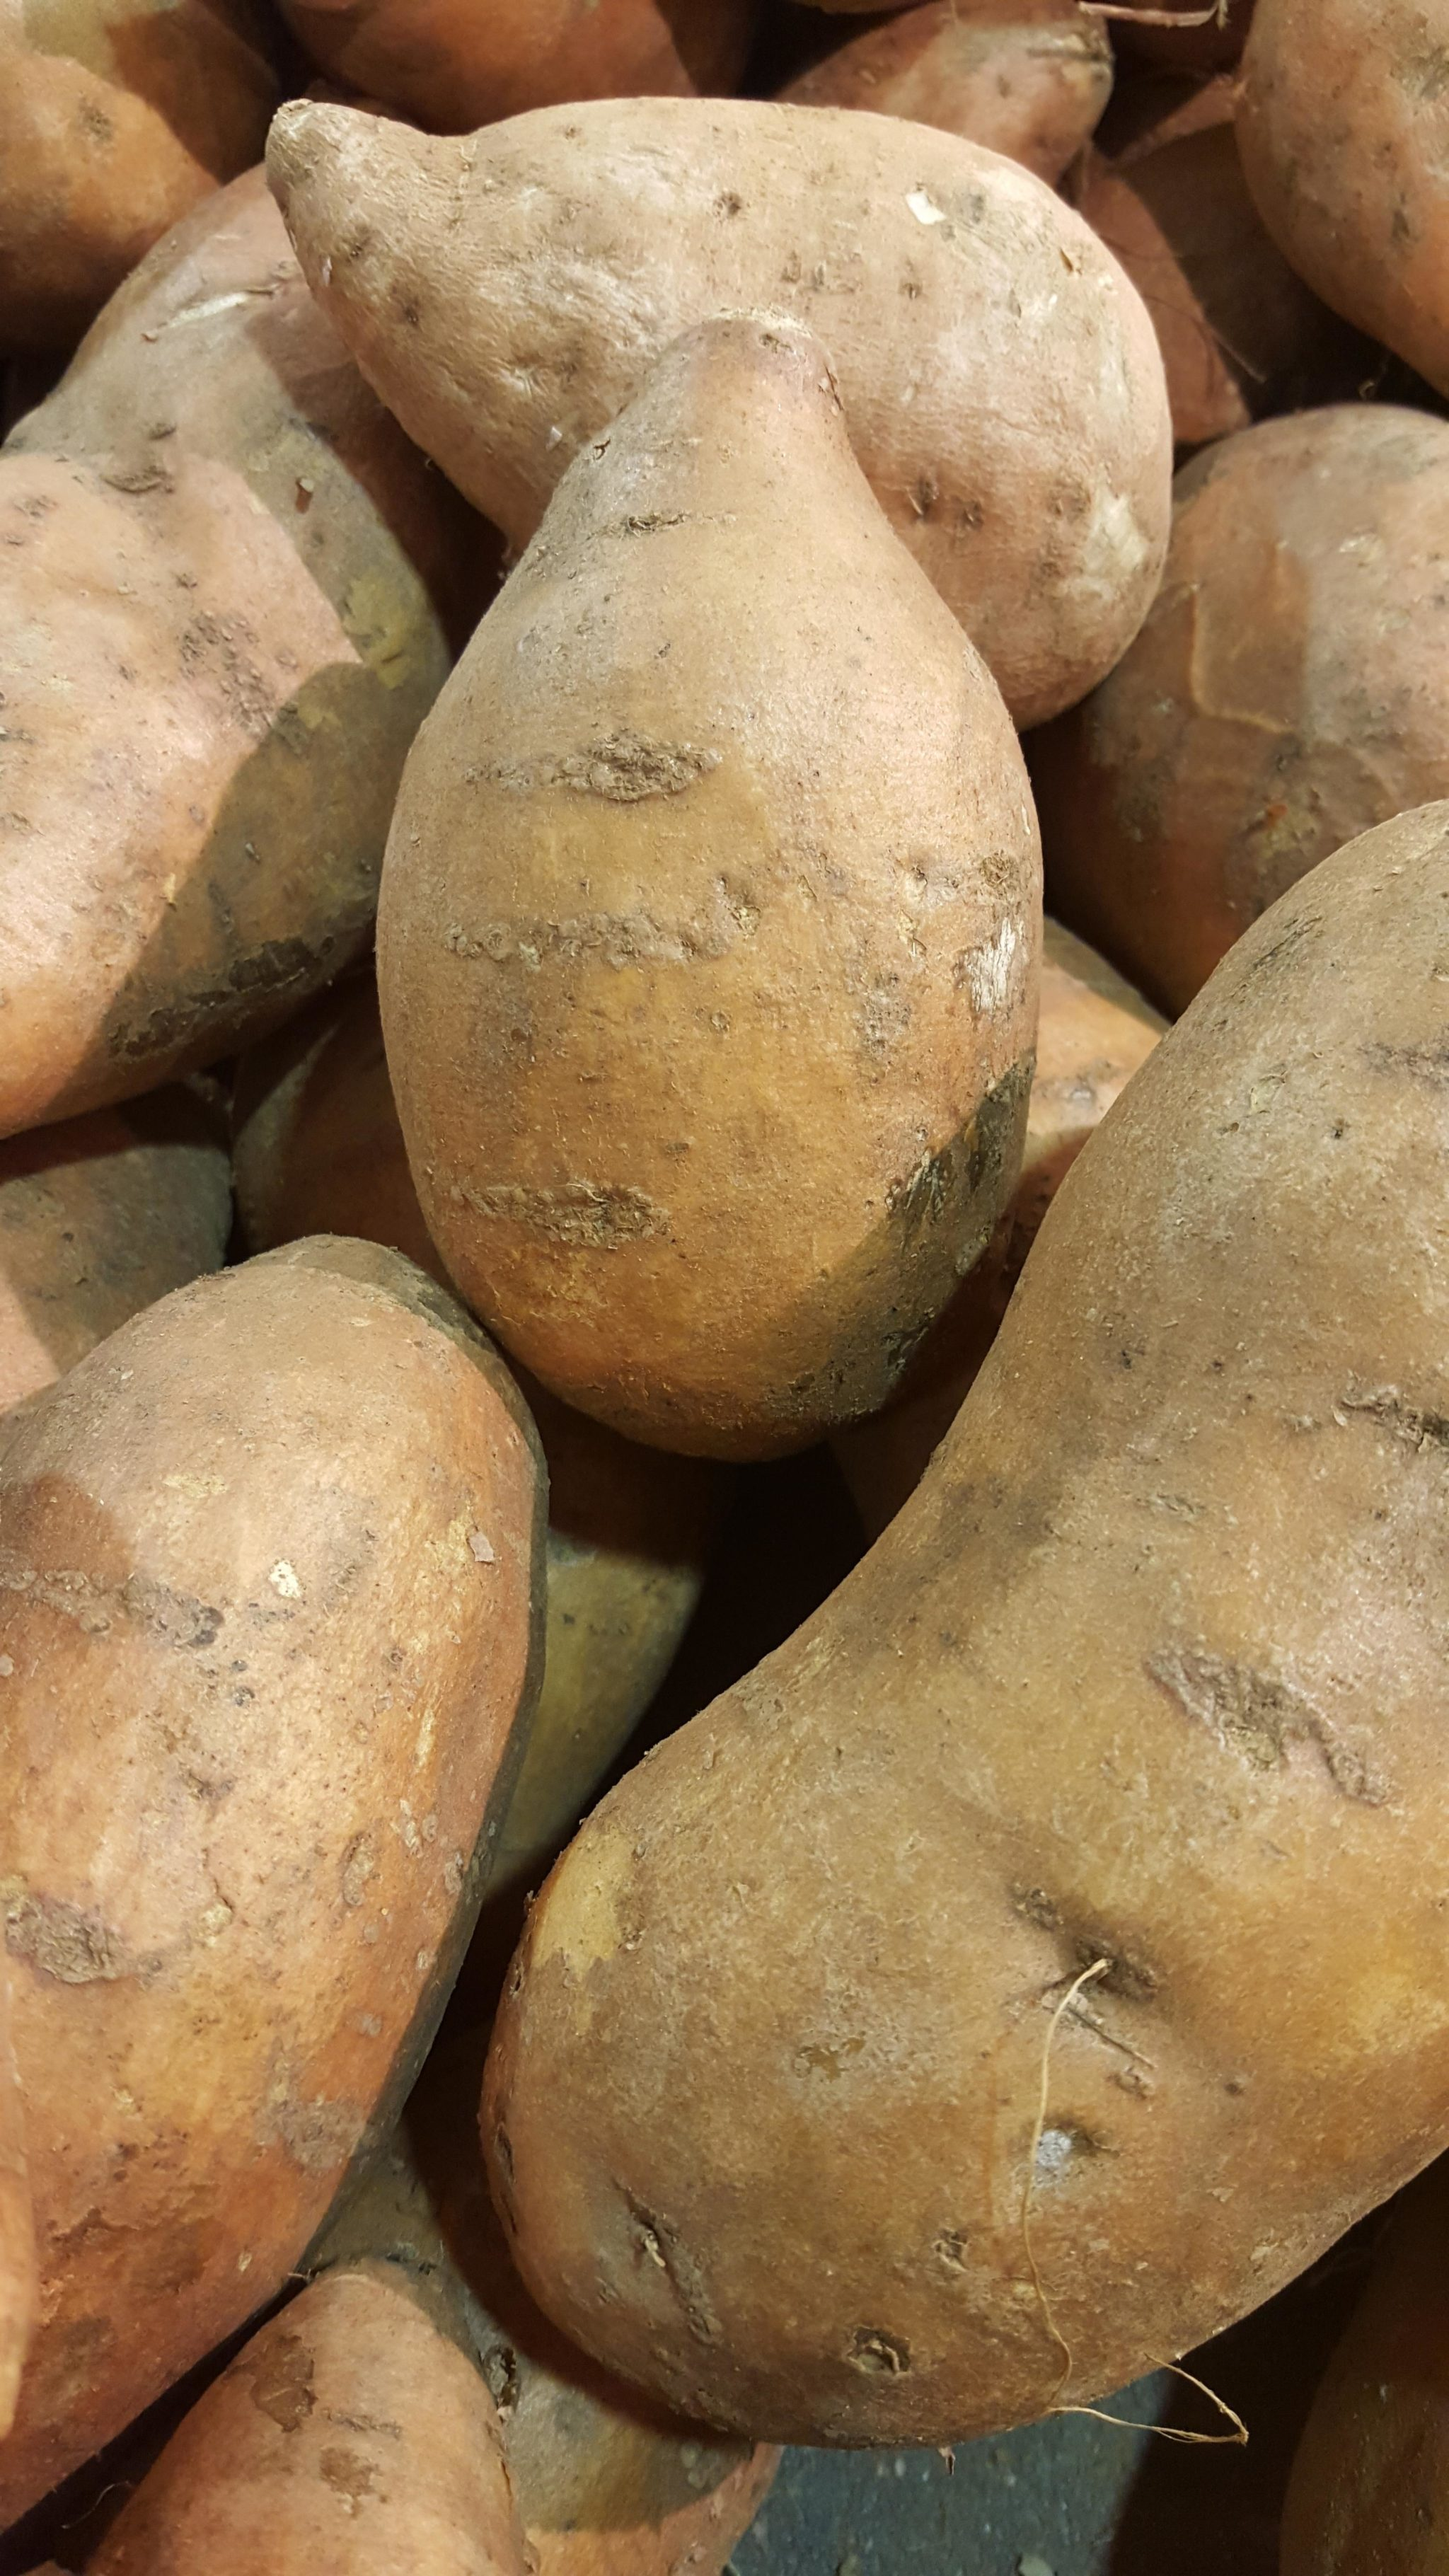 Sweet Potato Harvest Time in Georgia